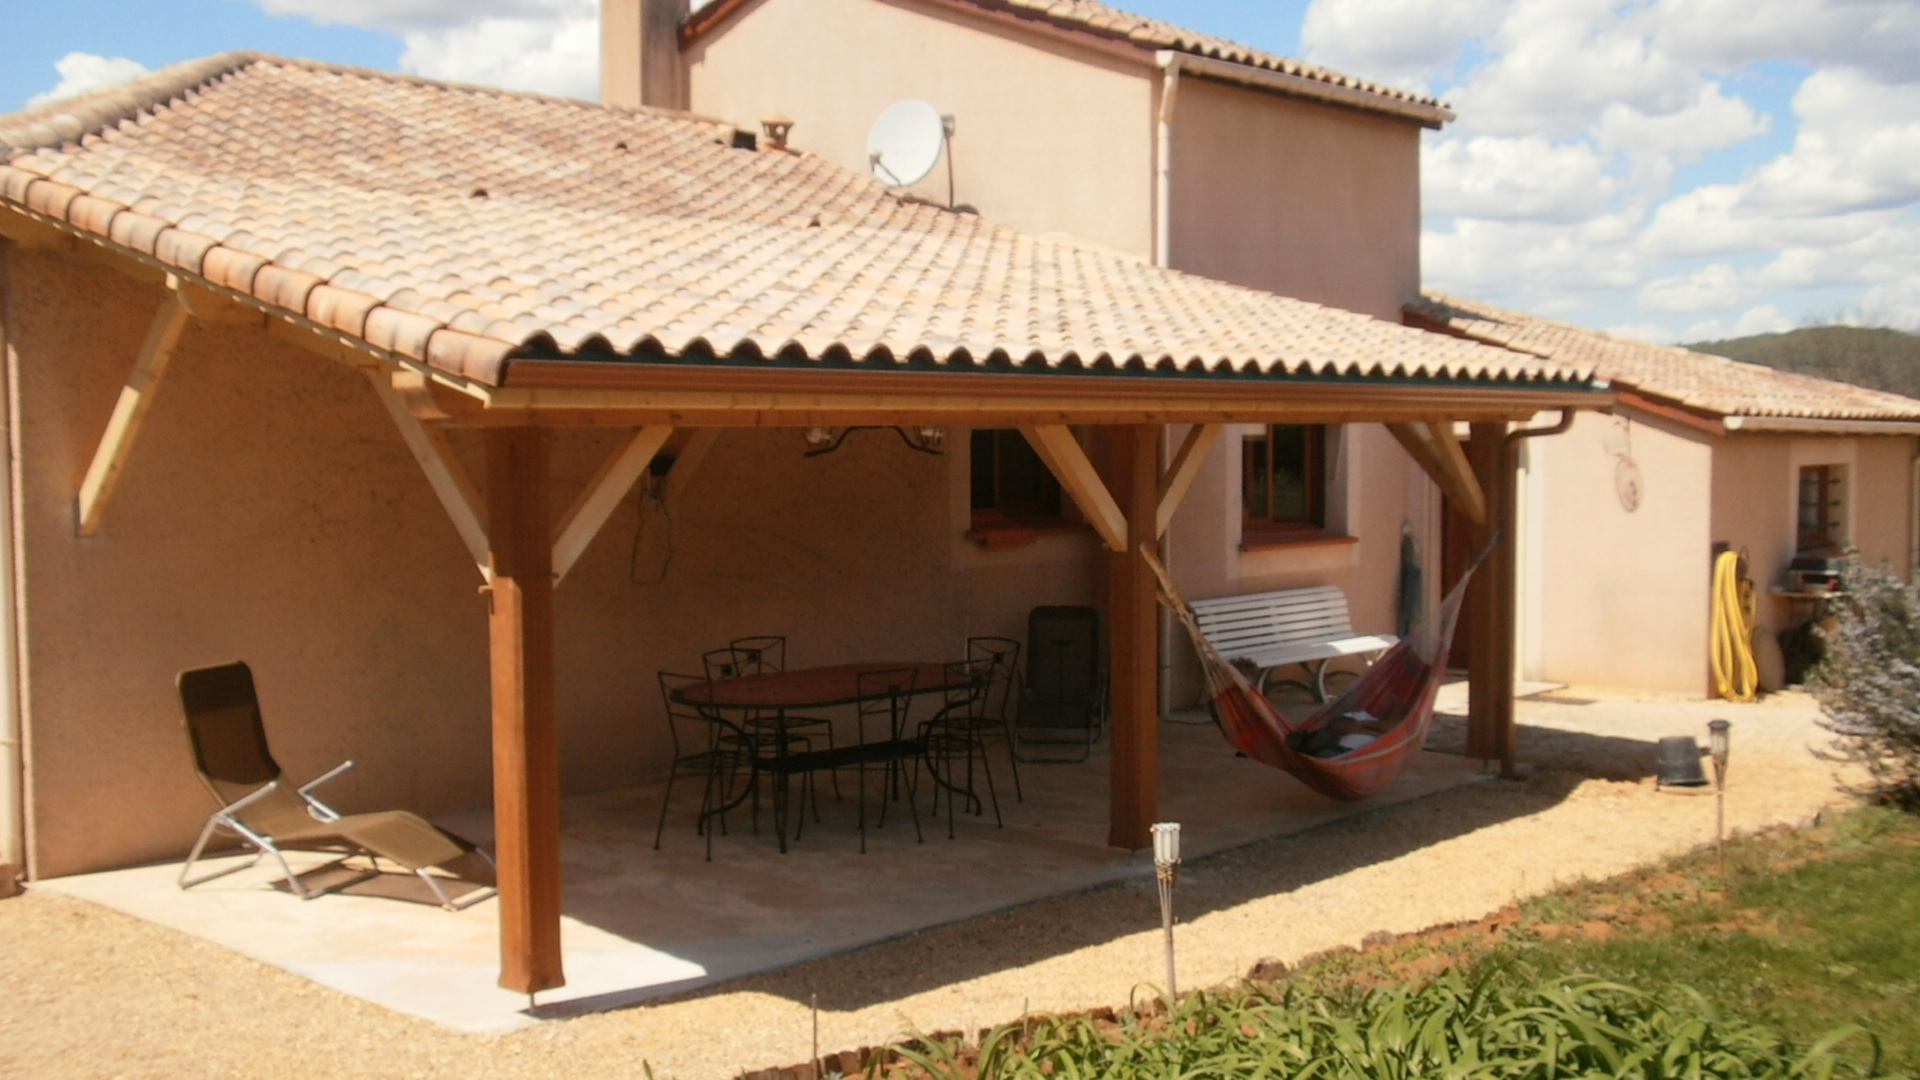 kit abri terrasse bois veranda. Black Bedroom Furniture Sets. Home Design Ideas